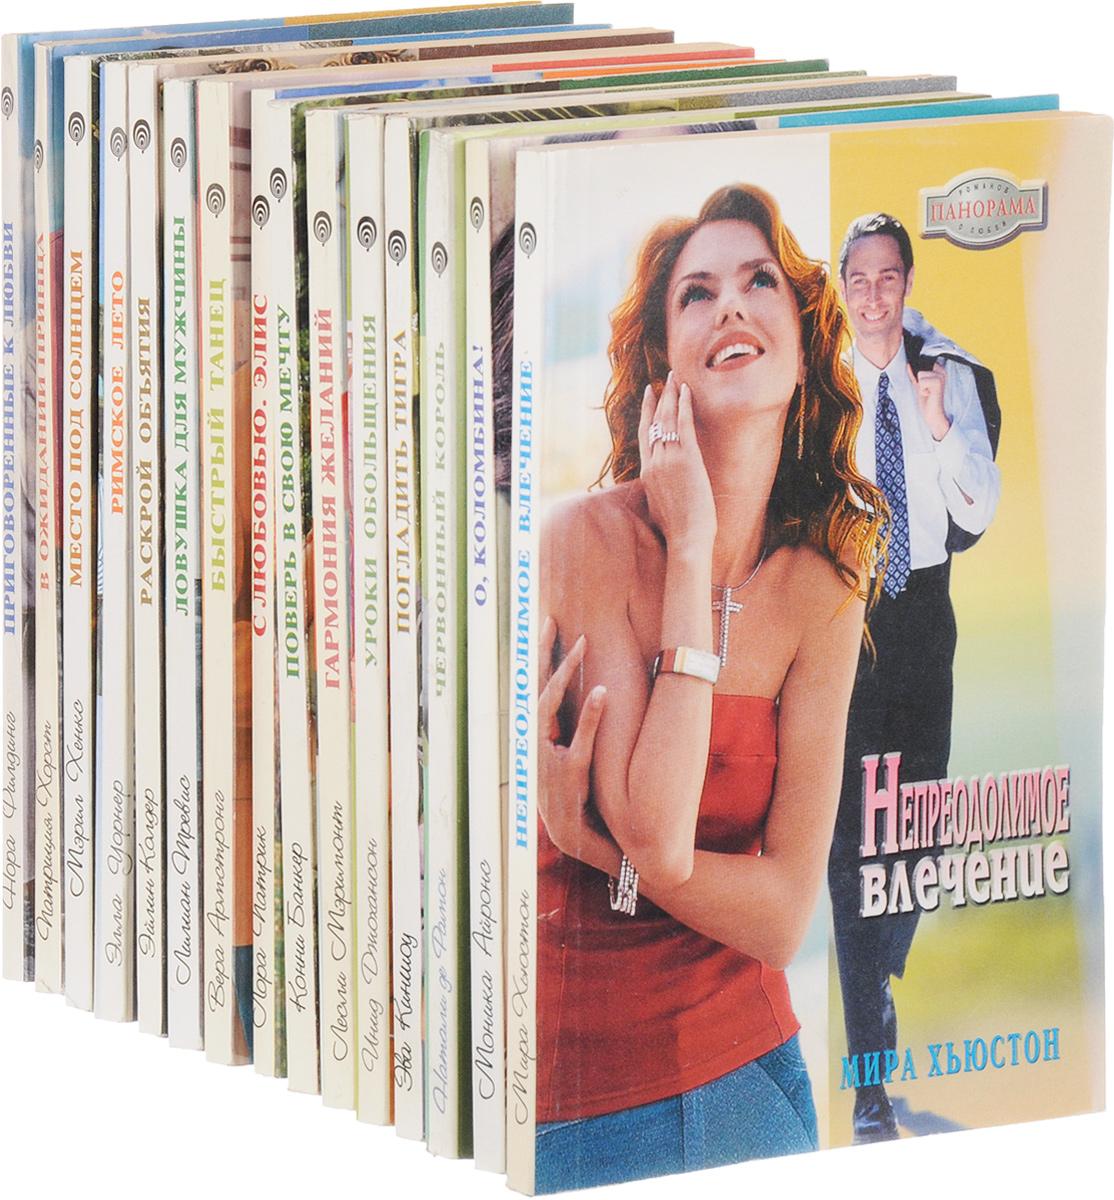 картинки книг панорама романов о любви установлен, рифты